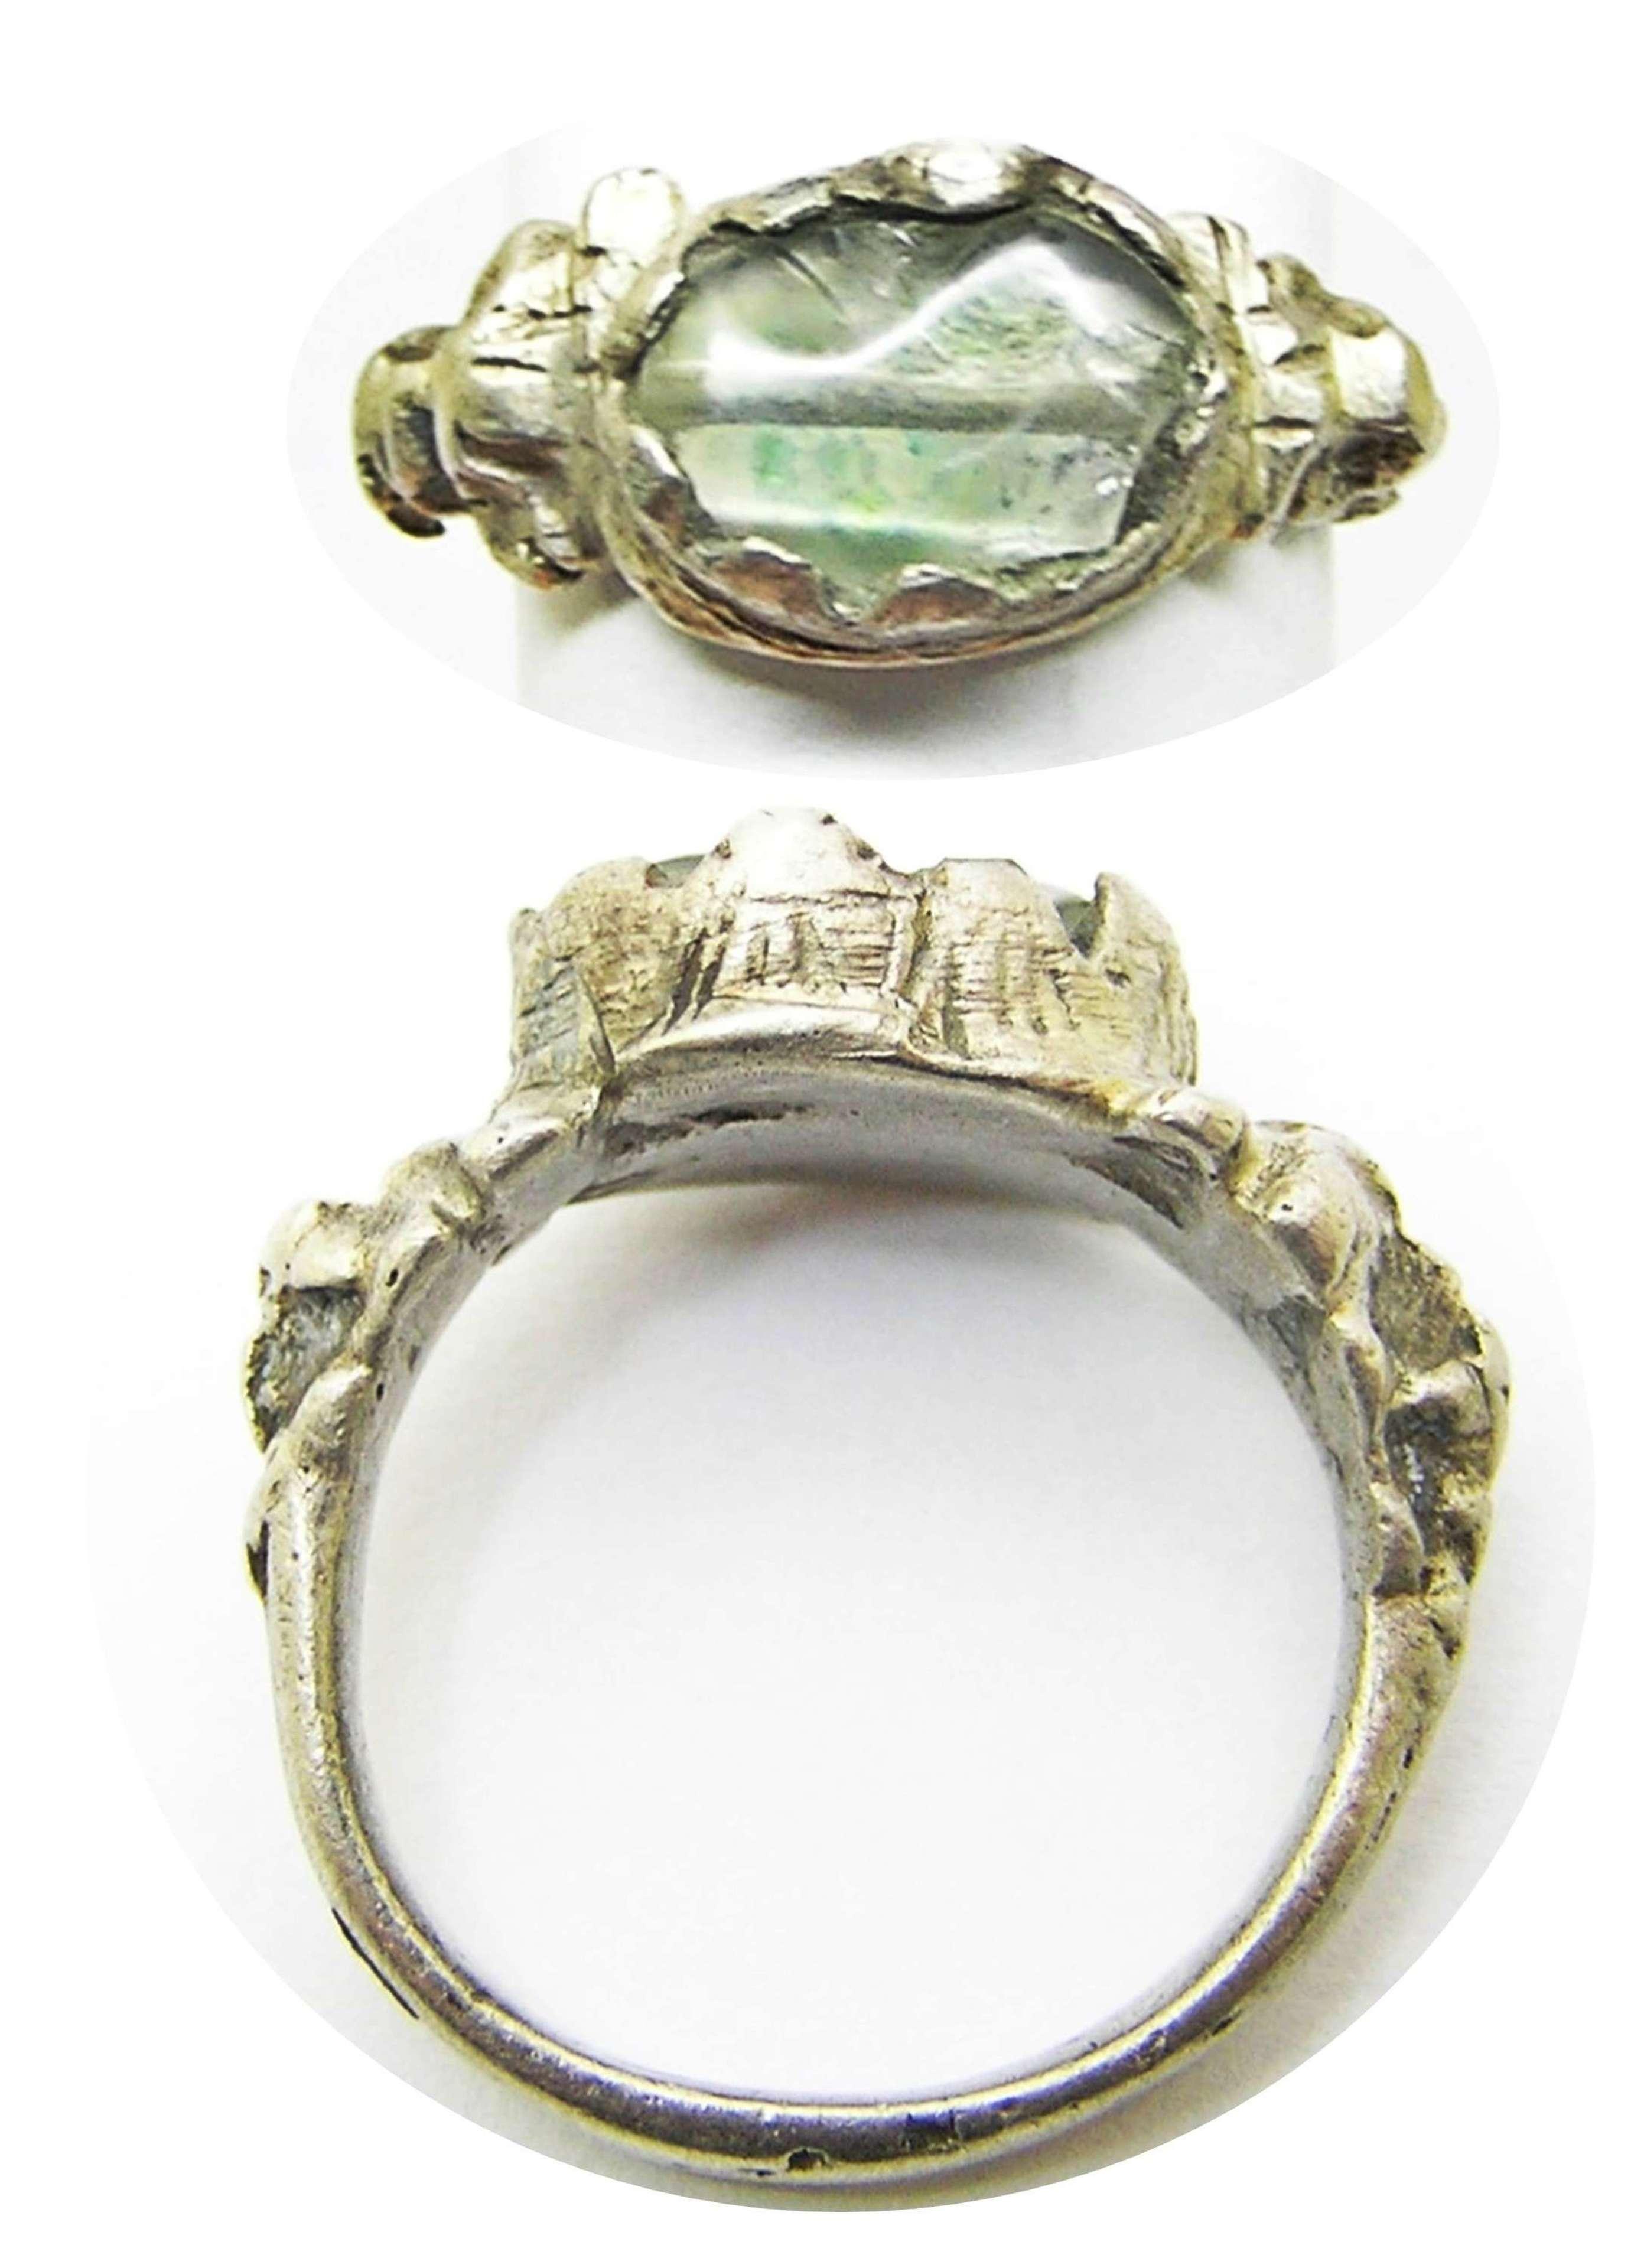 Renaissance silver and rock crystal gemstone finger ring